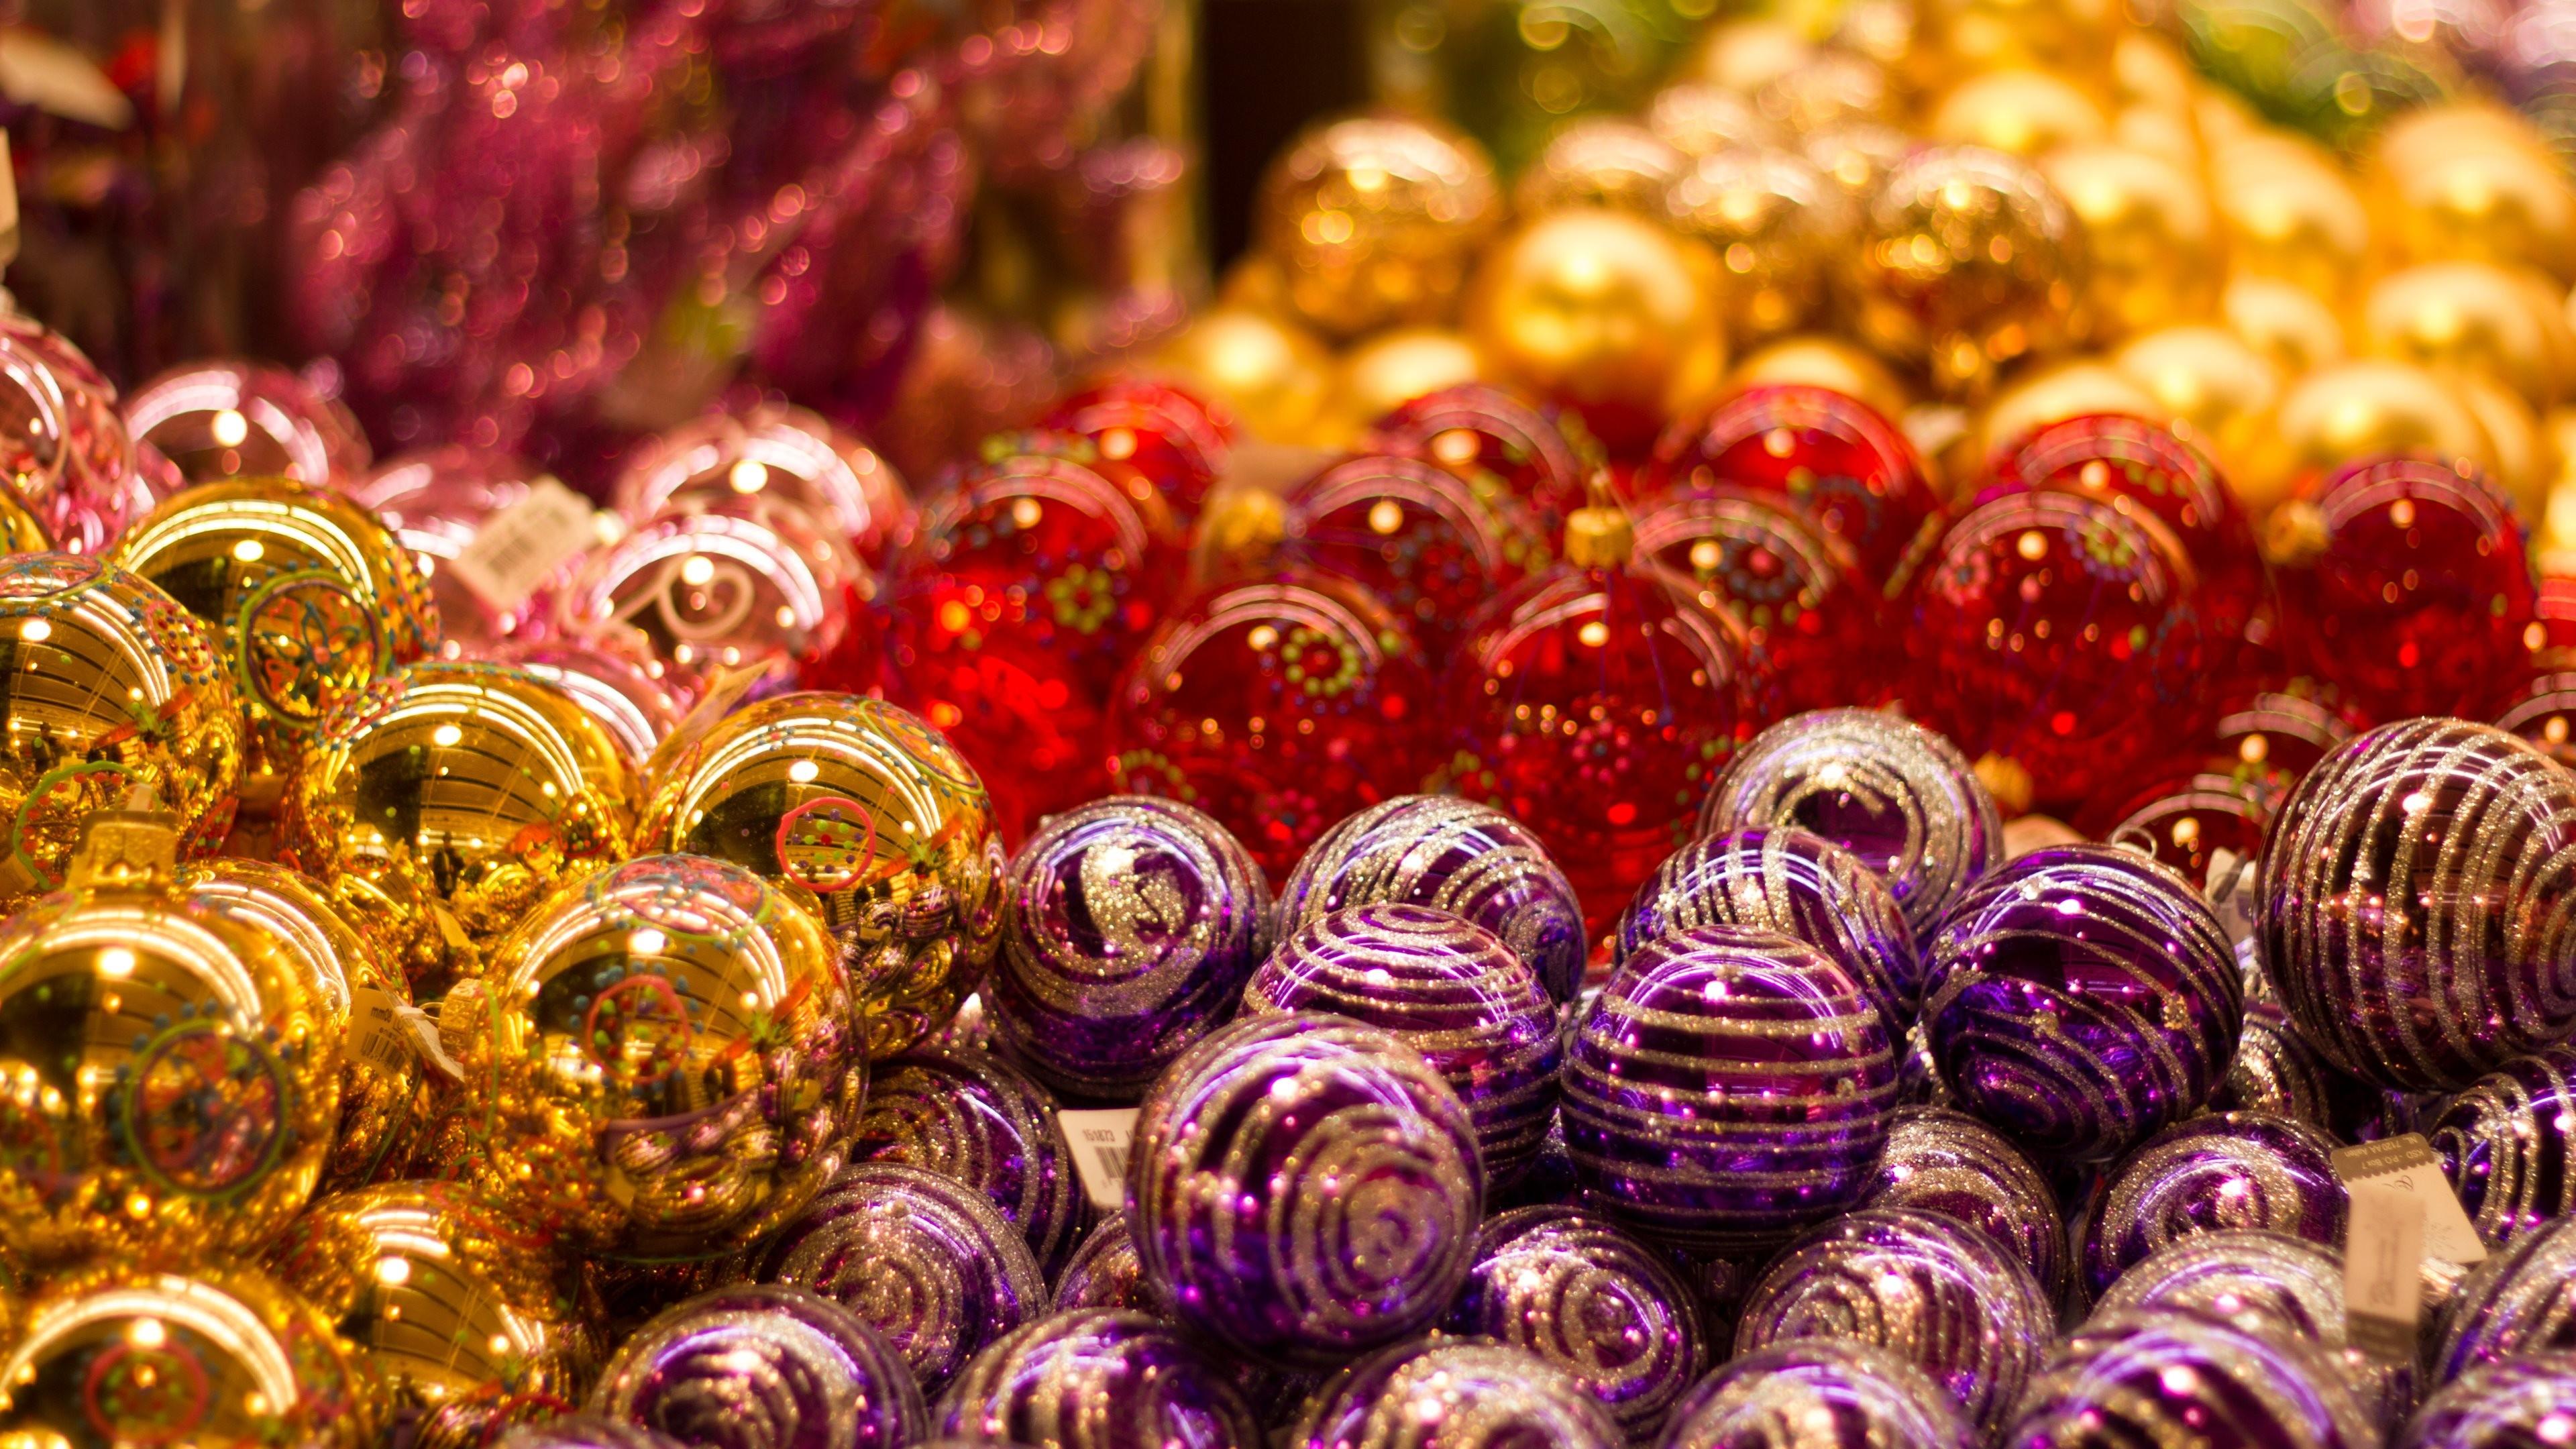 Wallpaper: Christmas Balls